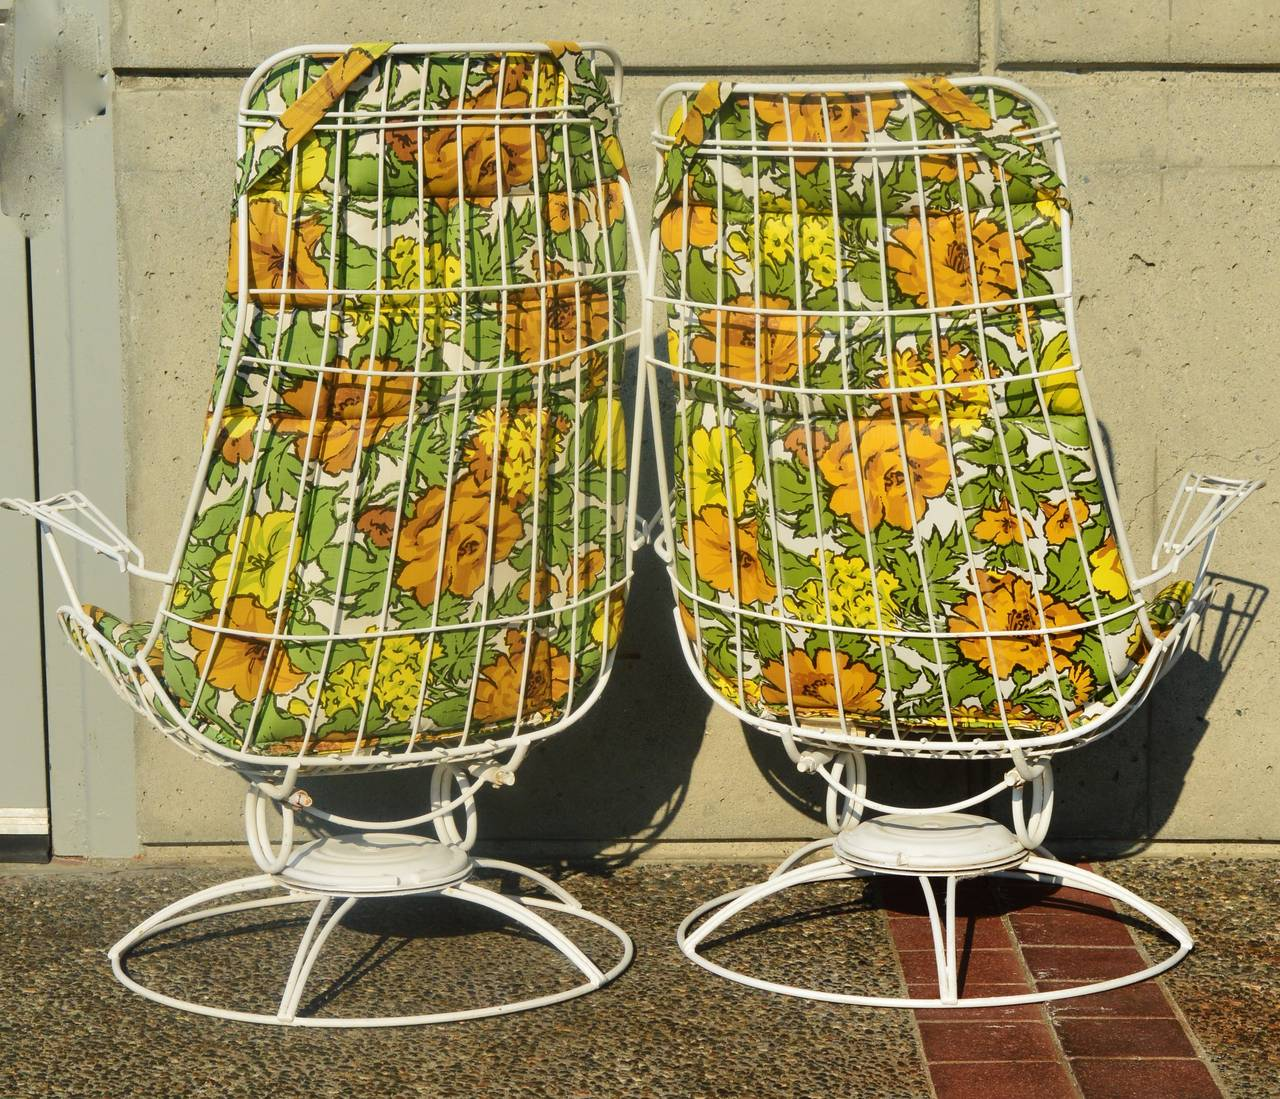 High Quality Rare Pair Homecrest Rocking Lounge Chairs U0026 Ottoman W/ Original Cushions 3